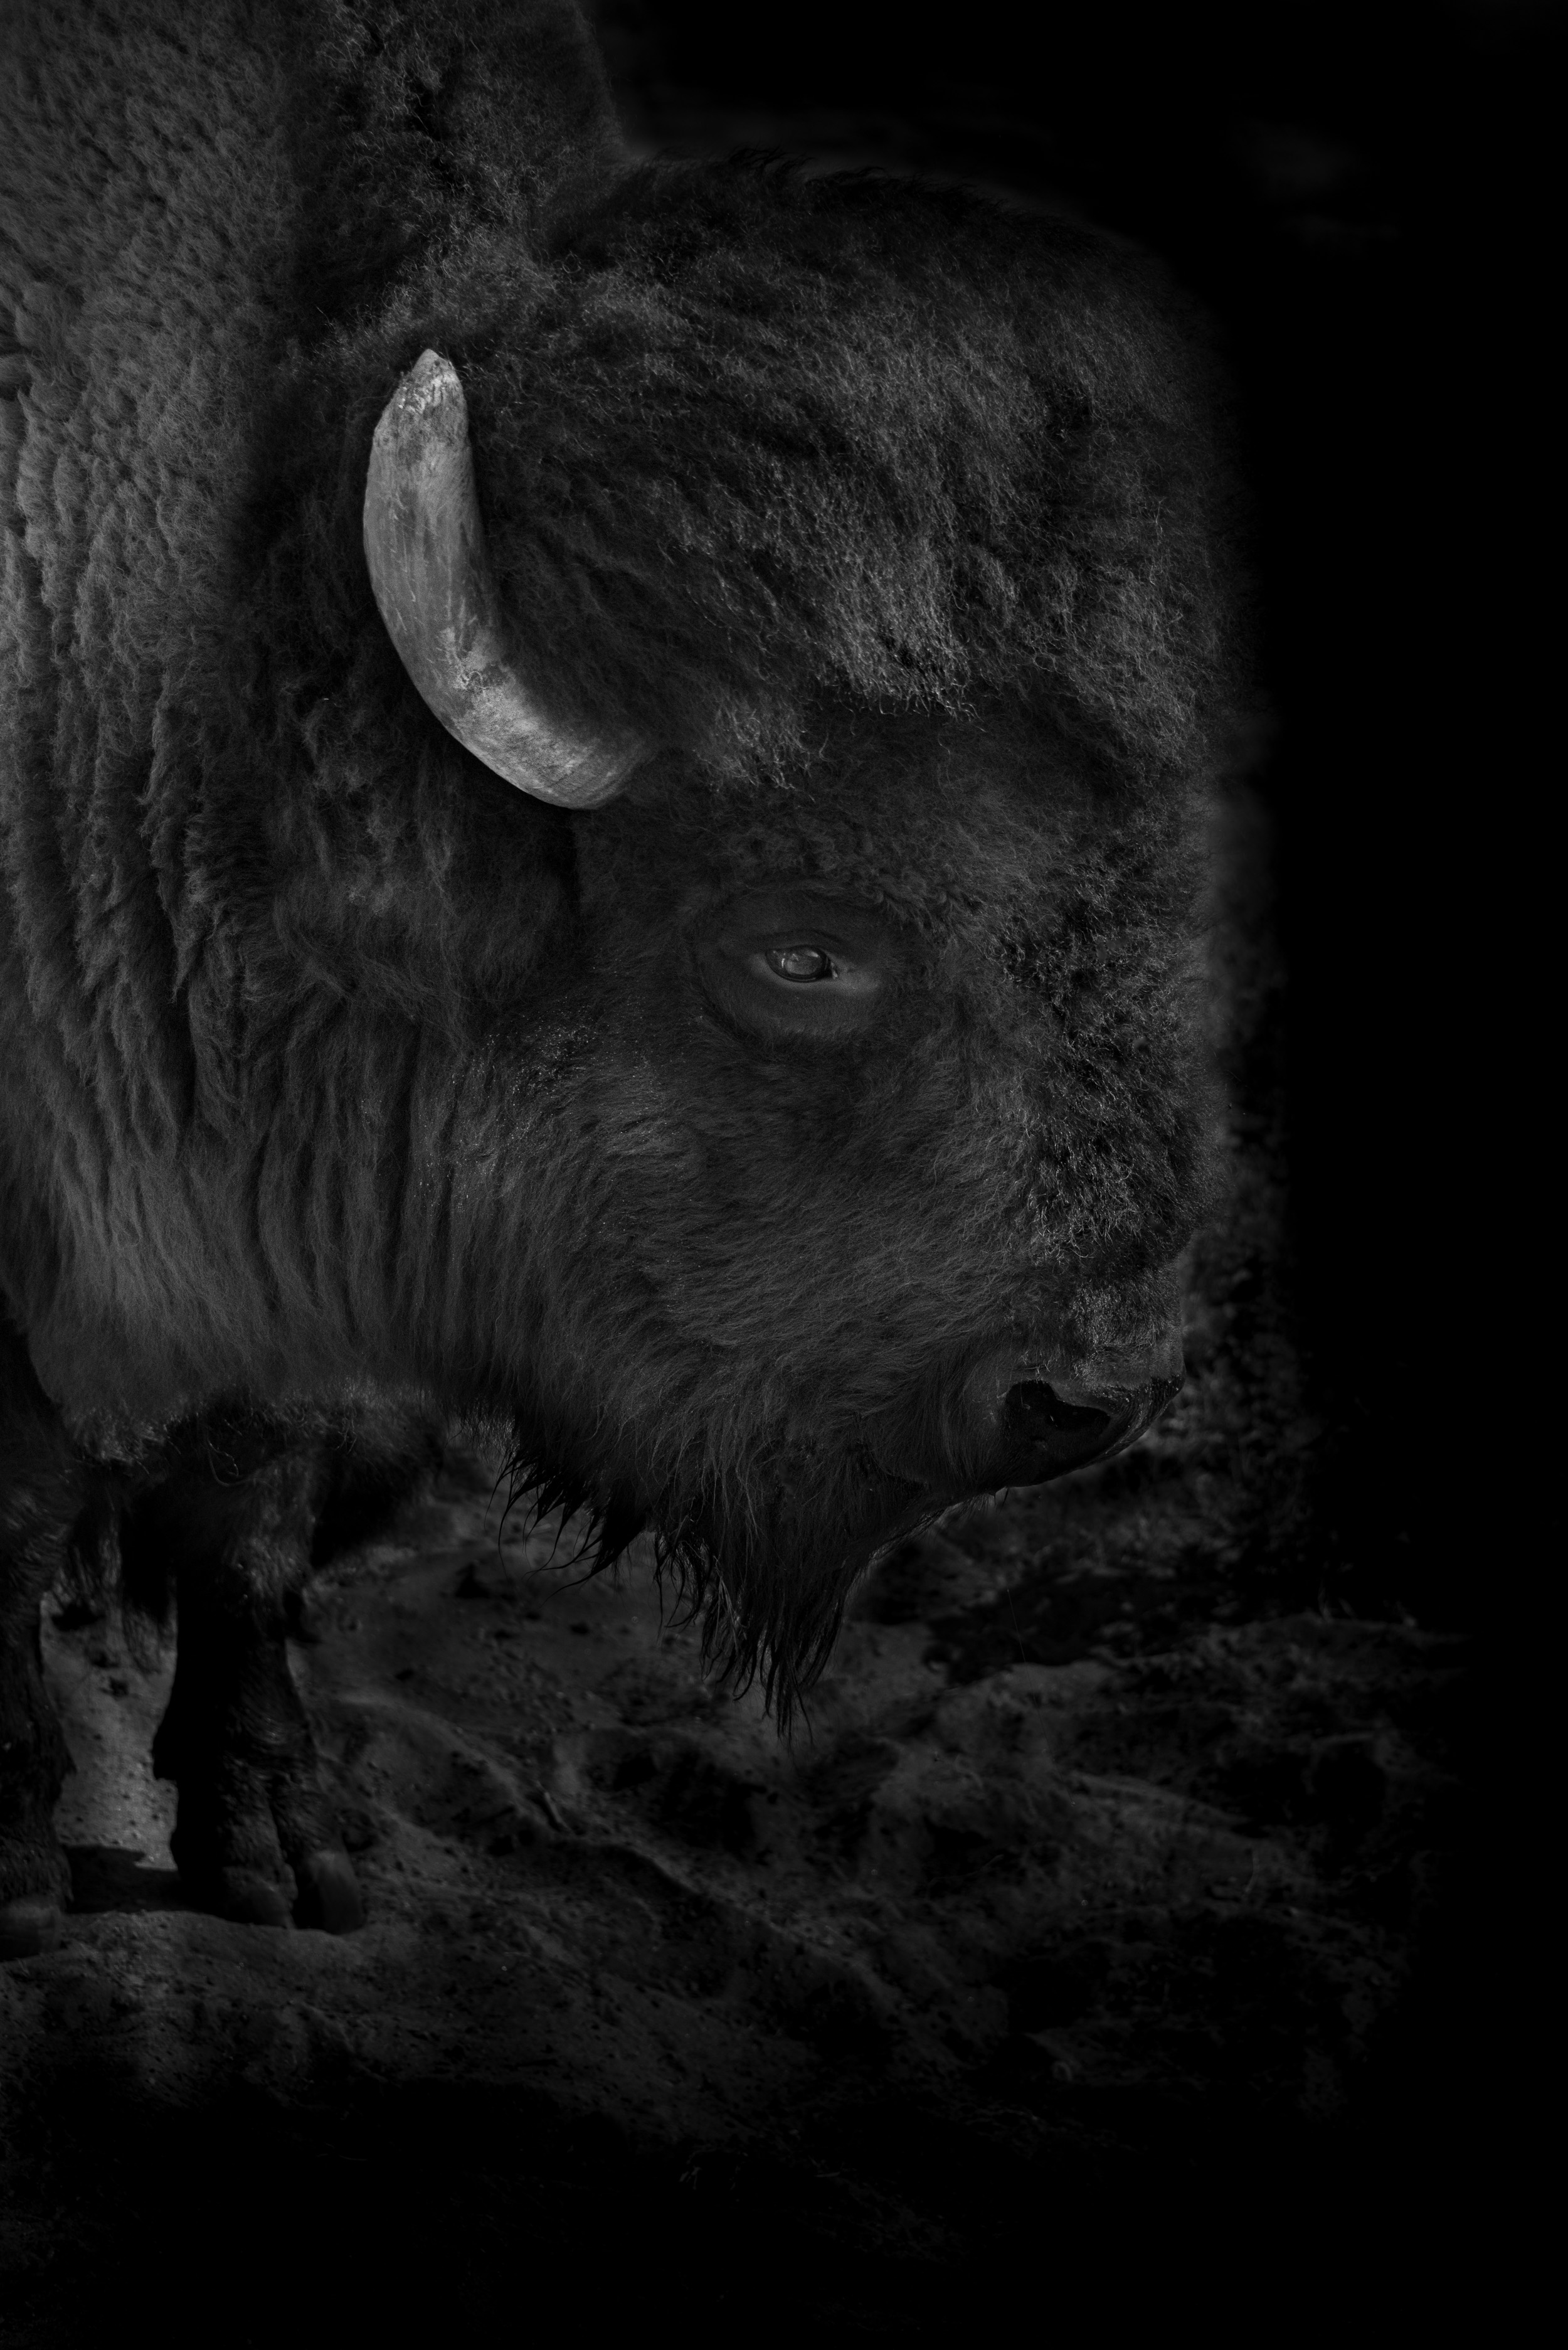 Dark Buffalo, Pauma Valley, California  © Robert Welkie 2018